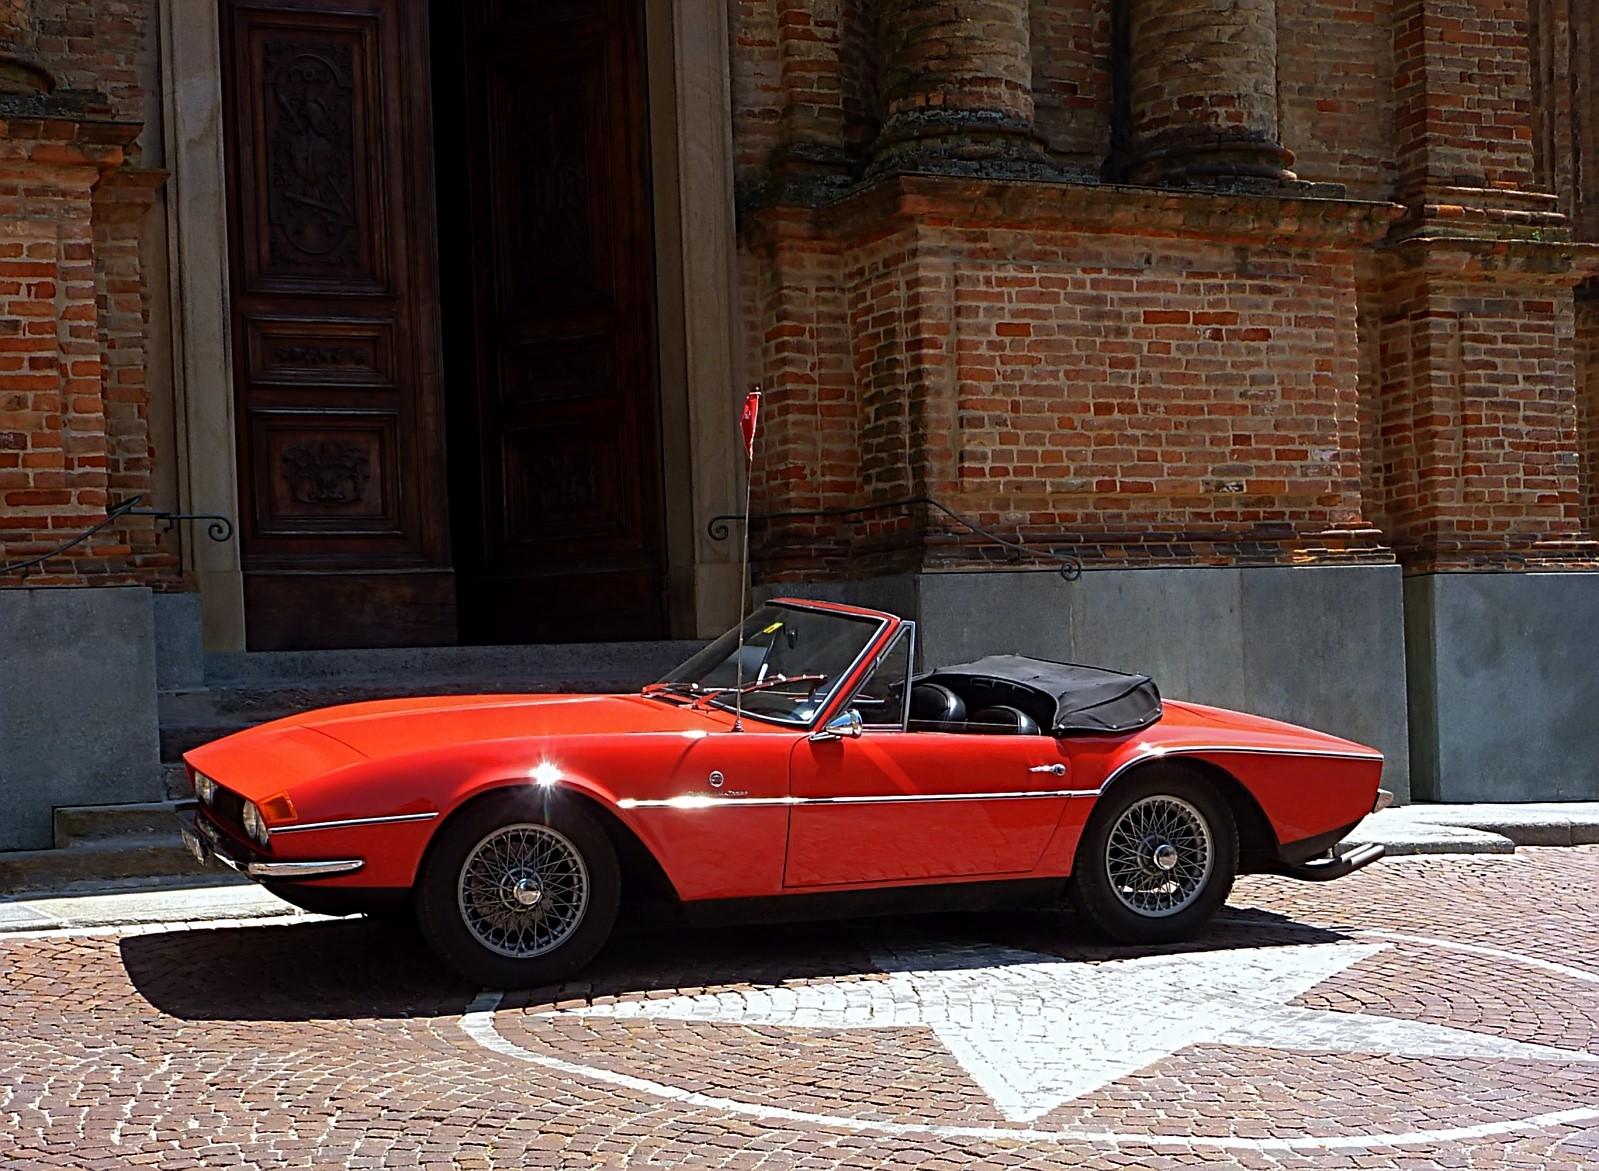 1968 Michelotti TR5 Ginevra Prototype (46)